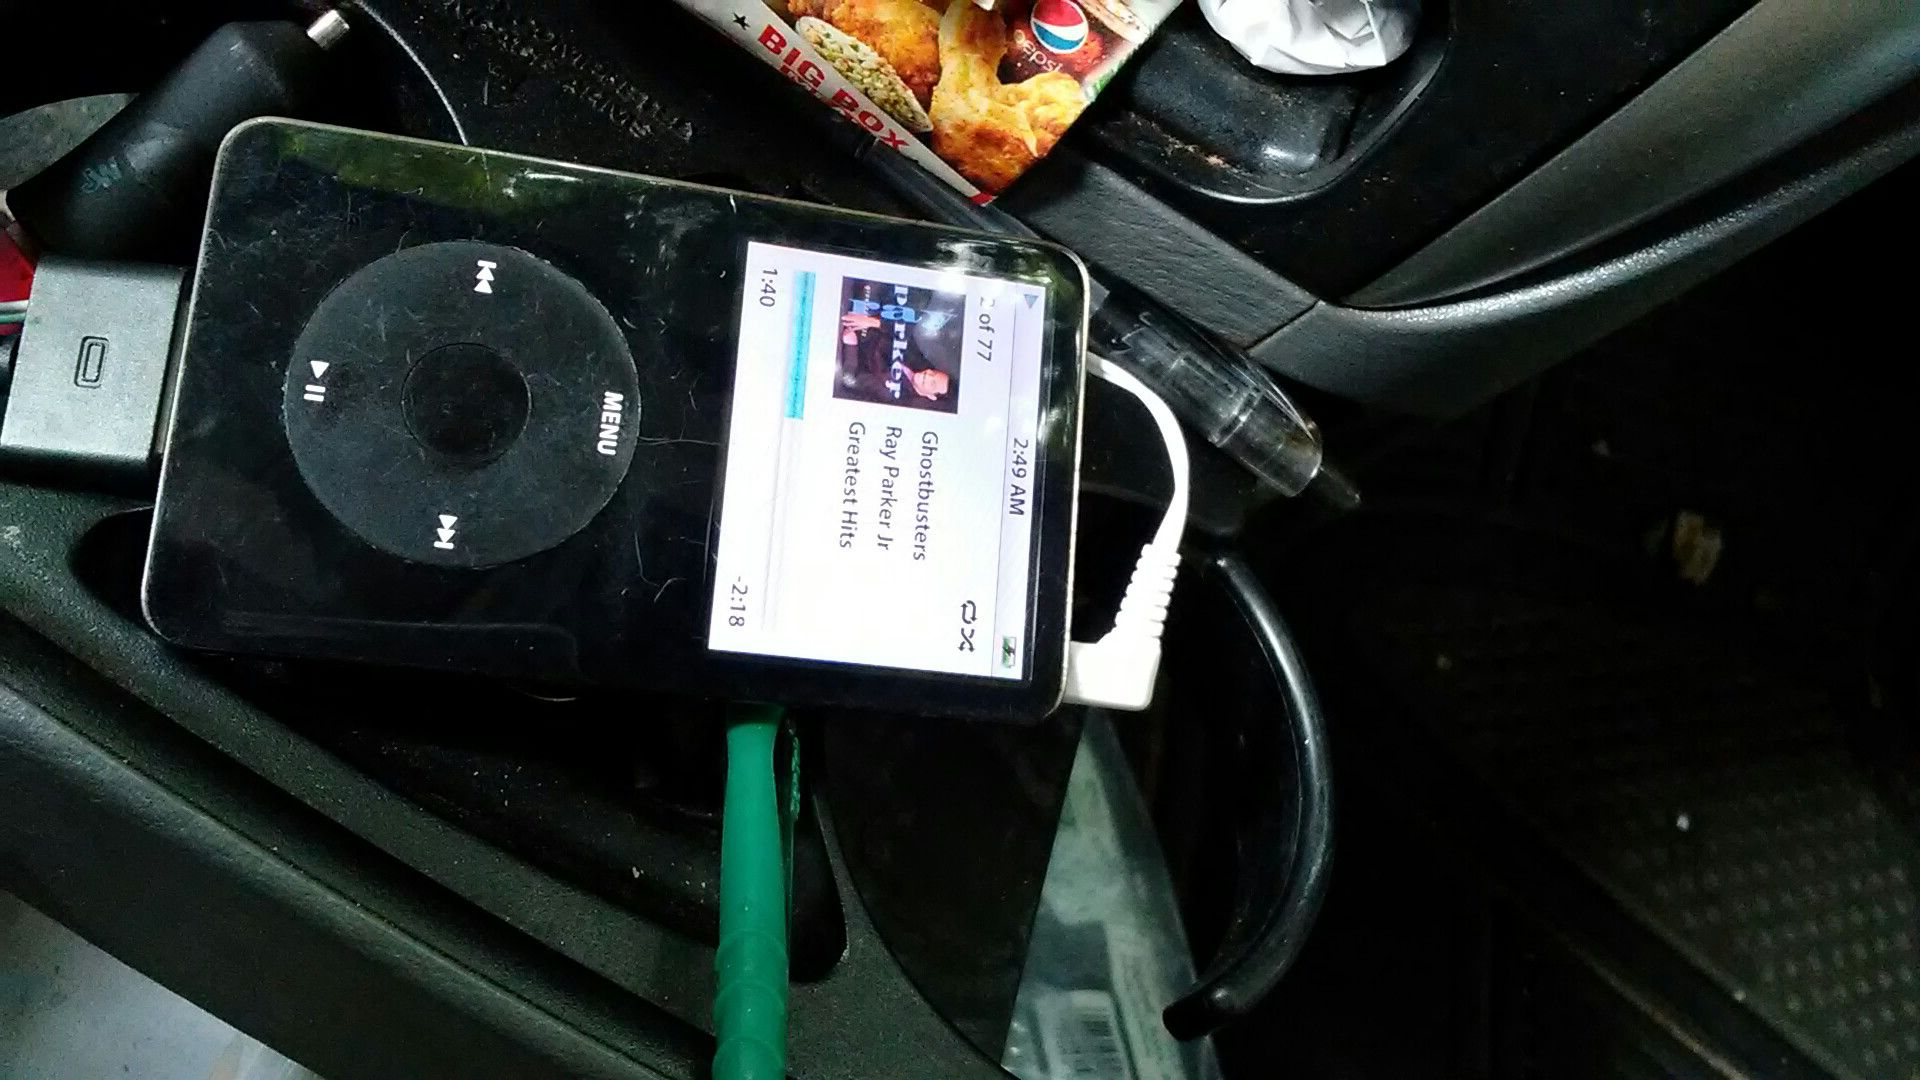 30 gb ipod classic